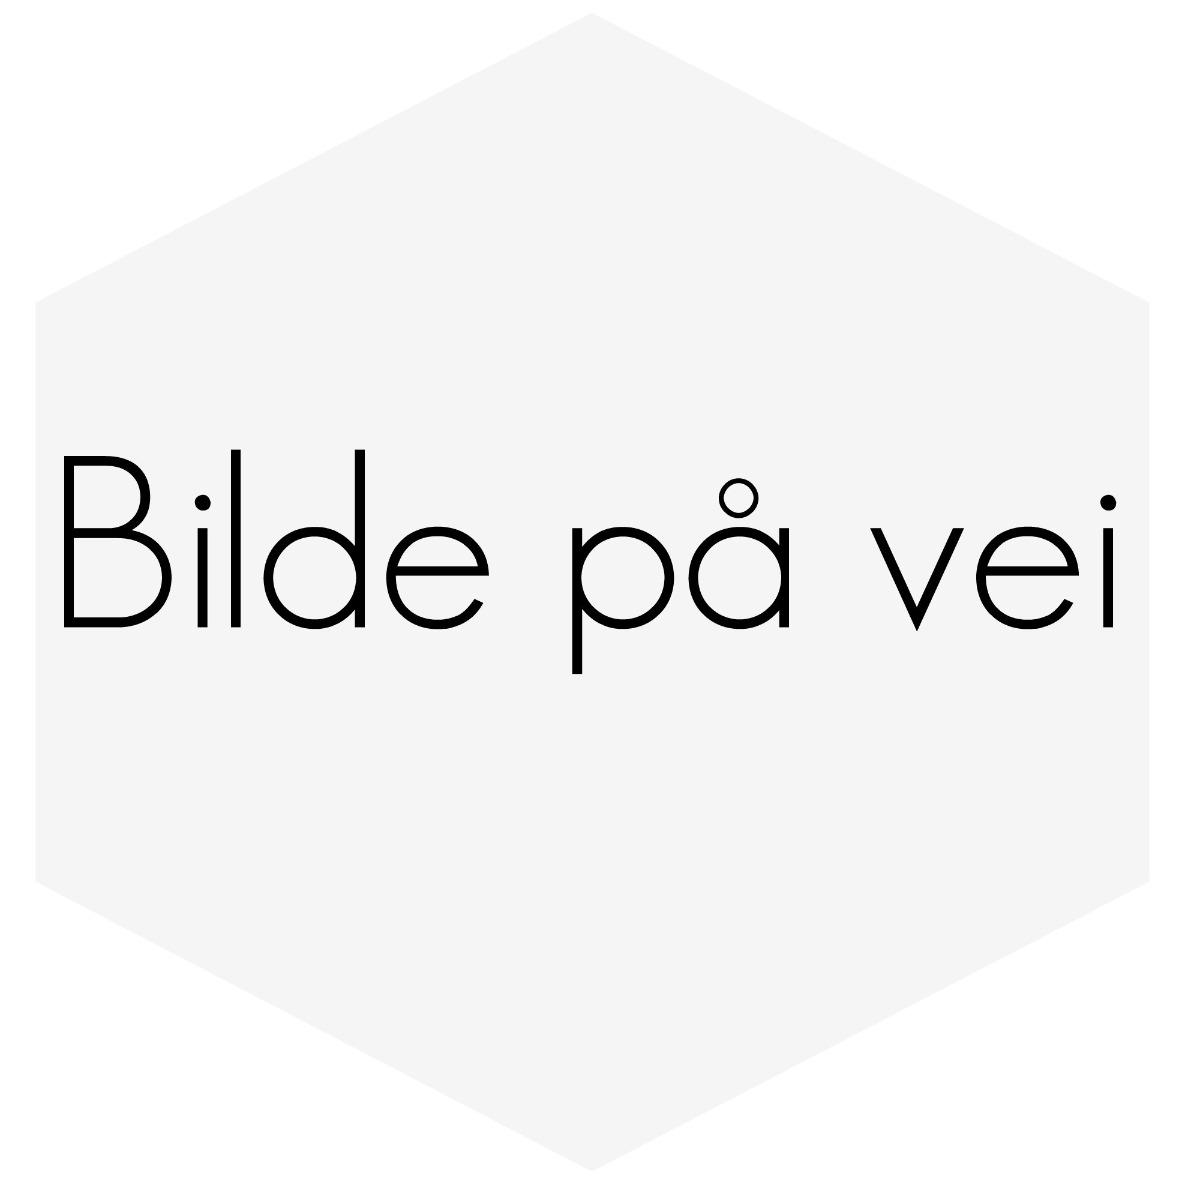 RELLE BLINKLYS 3 POLET VOLVO/ SAAB SE INFO